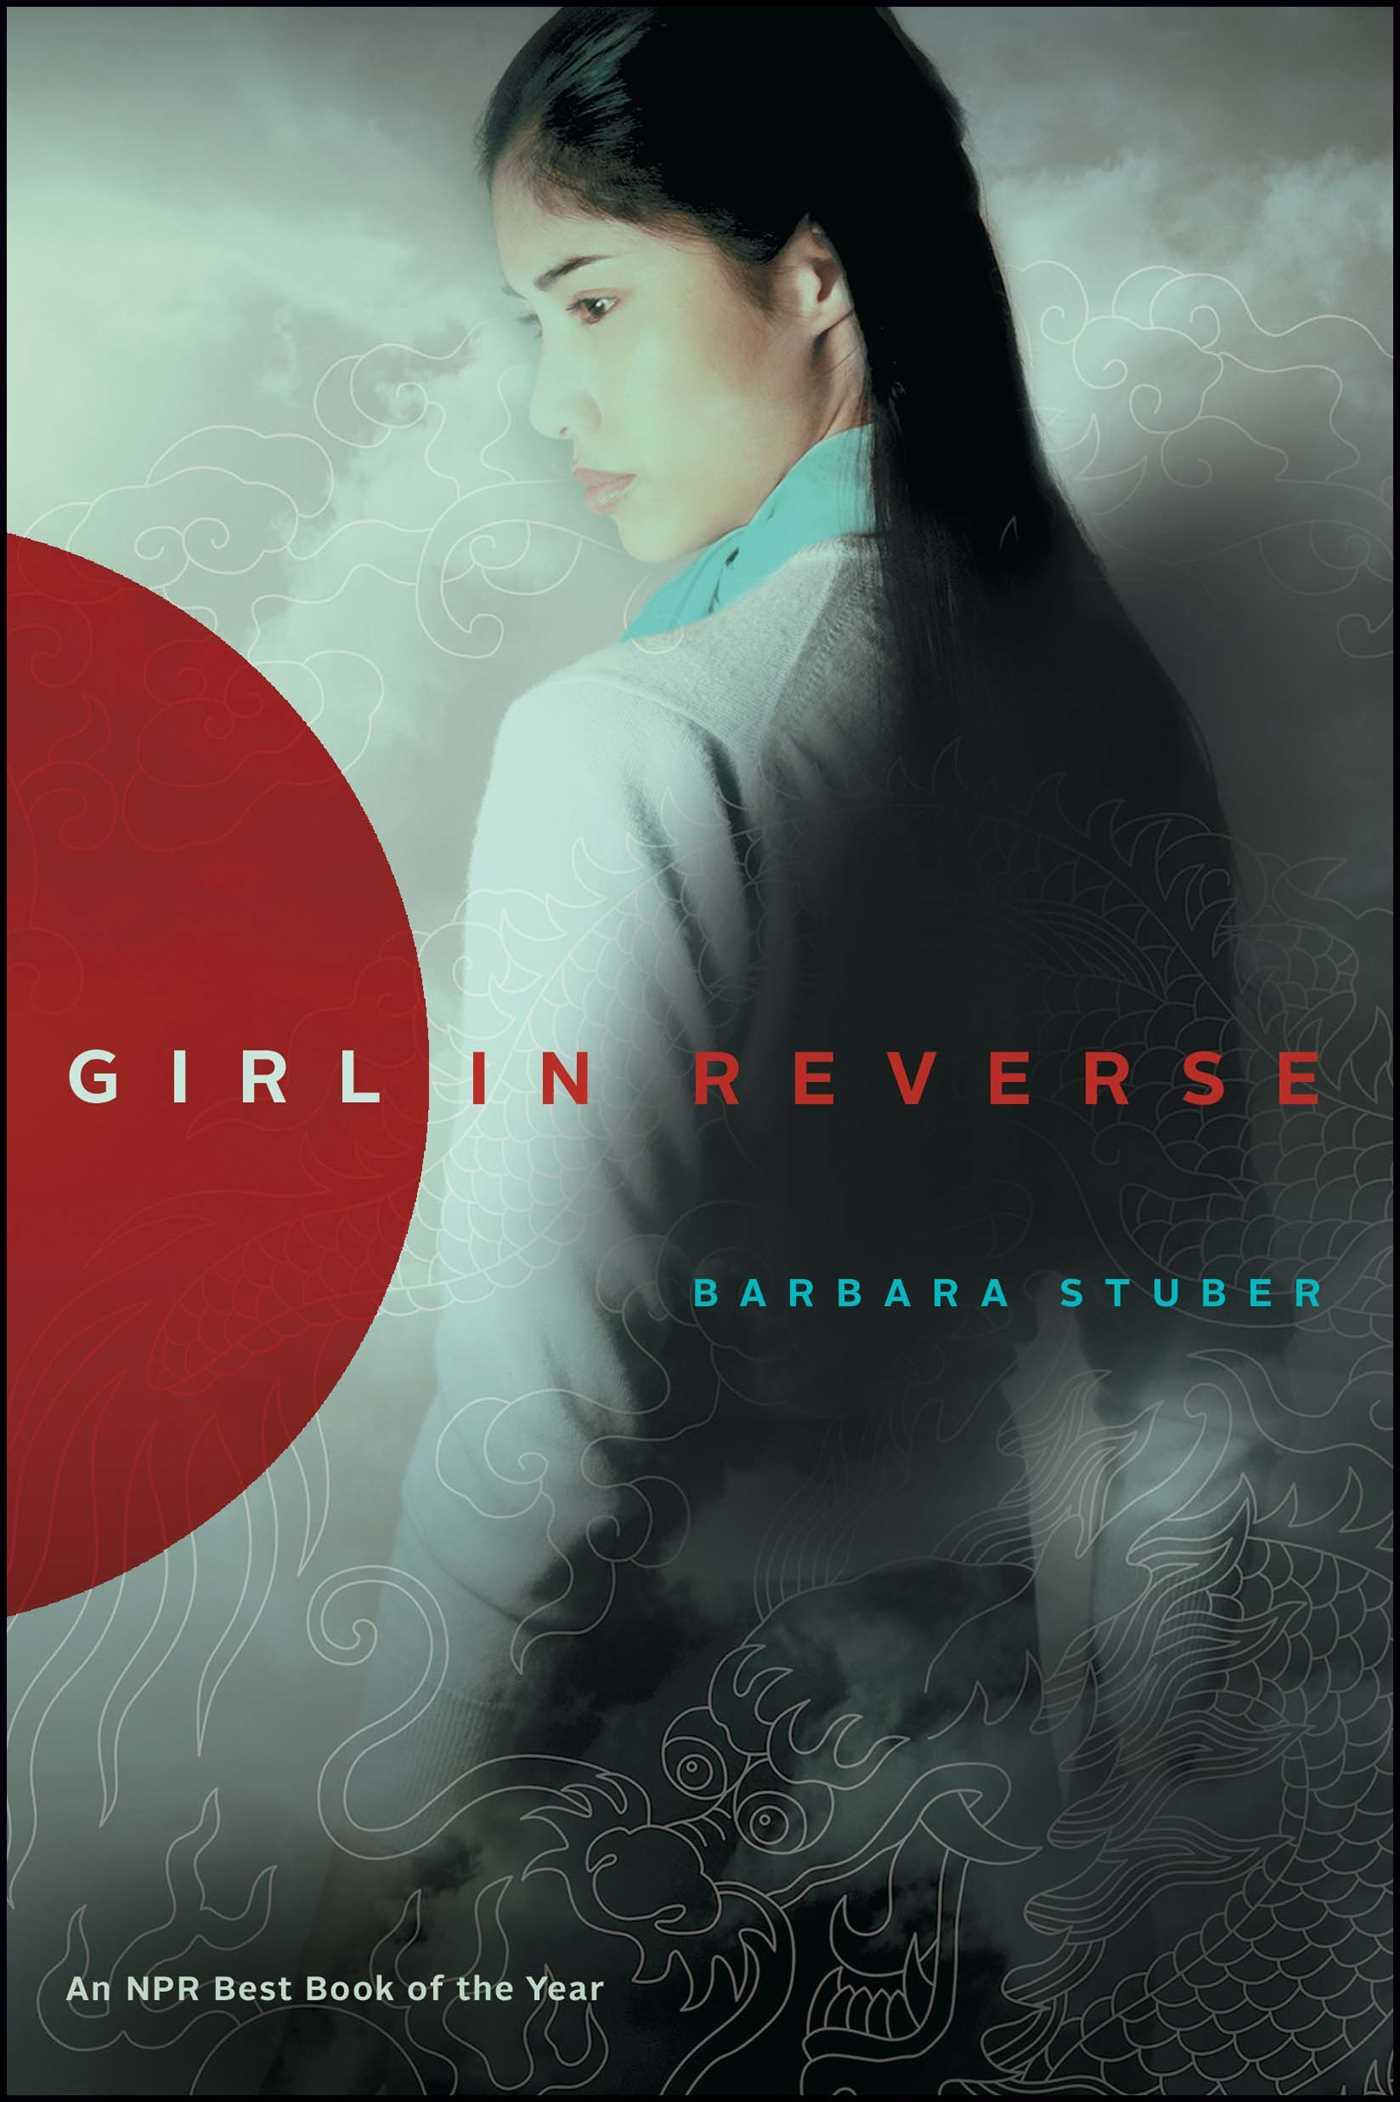 Girl in reverse 9781442497368 hr